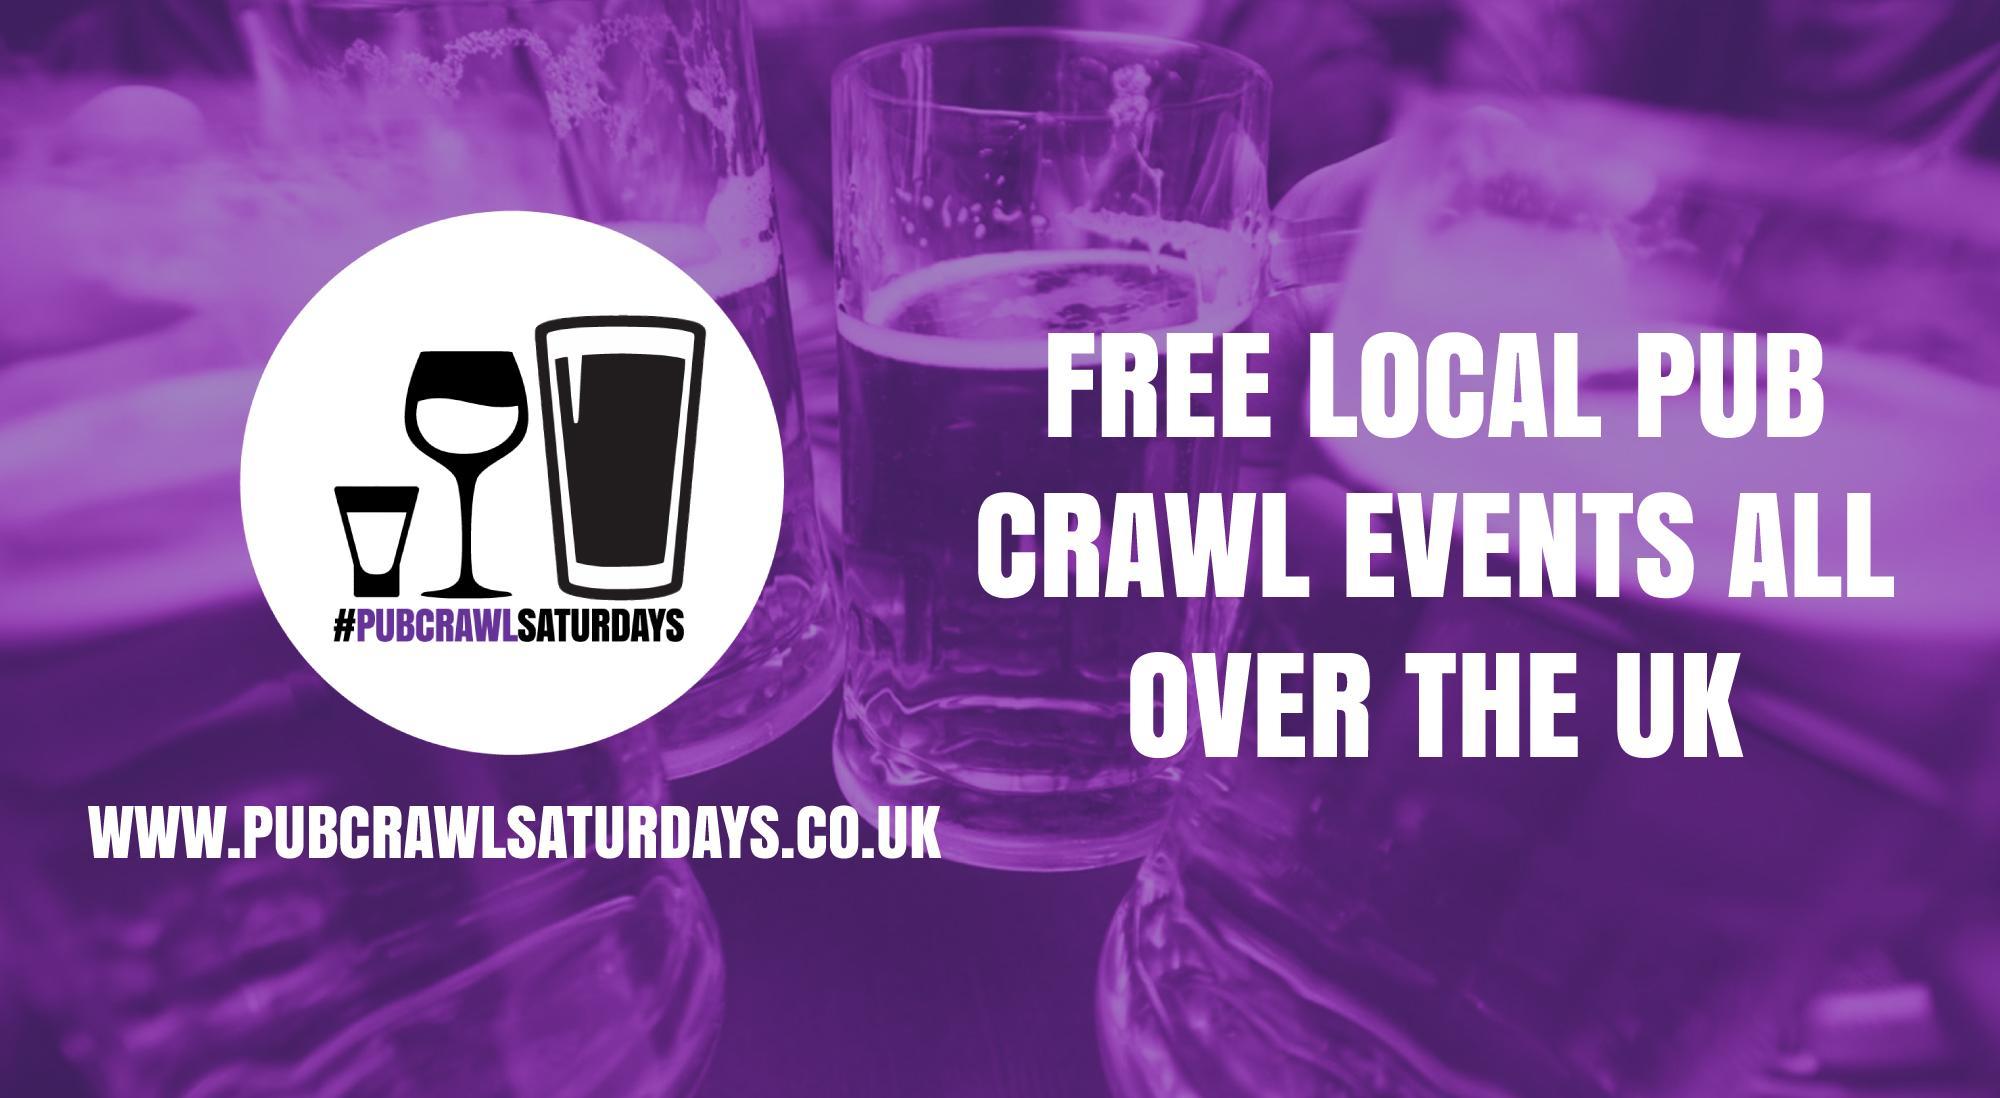 PUB CRAWL SATURDAYS! Free weekly pub crawl event in Stockton-on-Tees